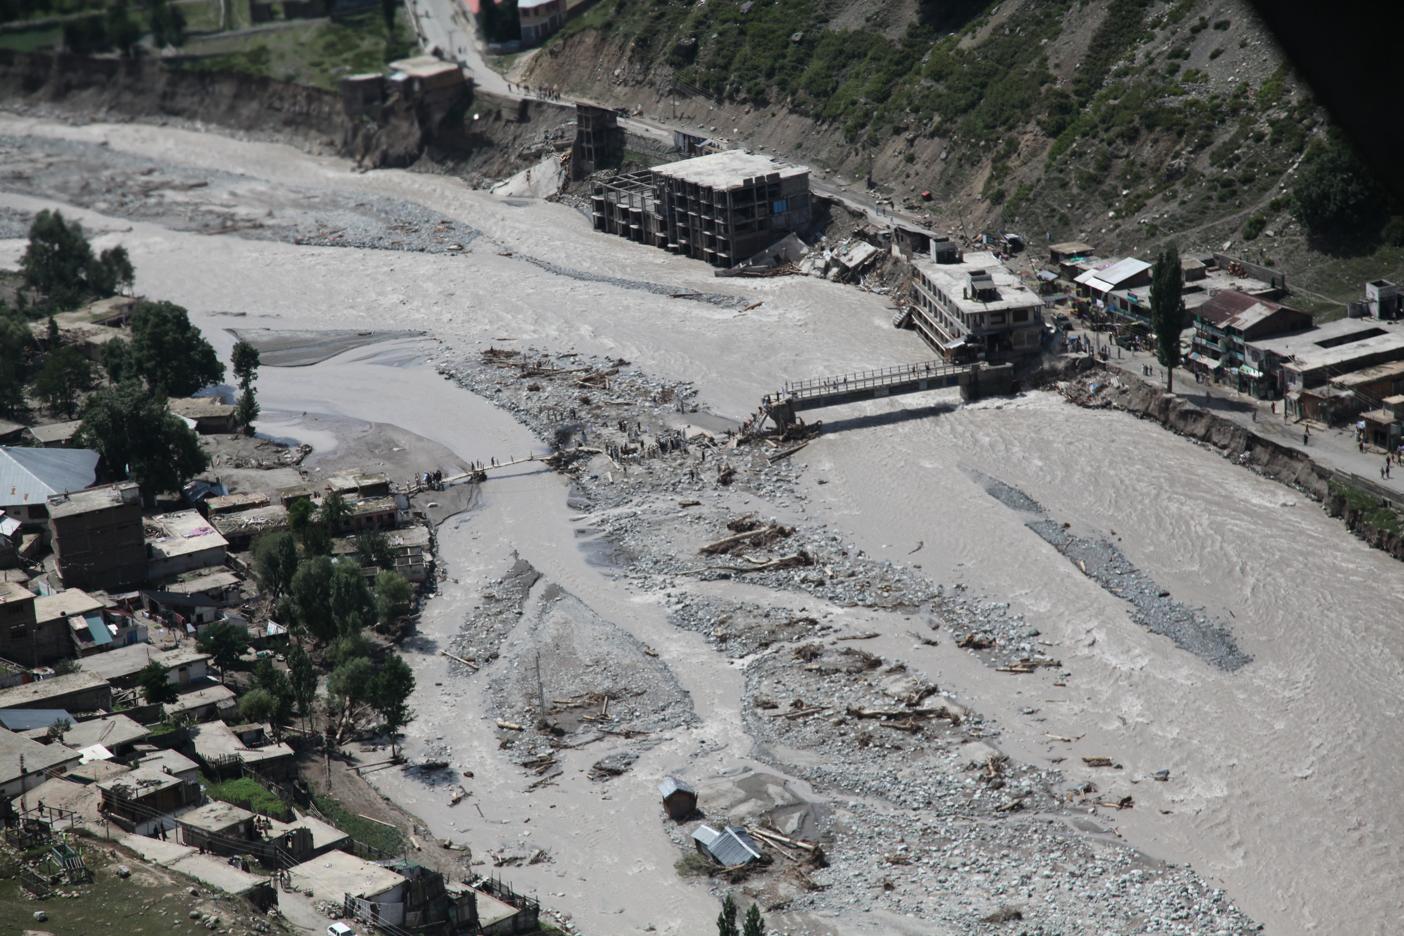 Short essay on Floods in Pakistan